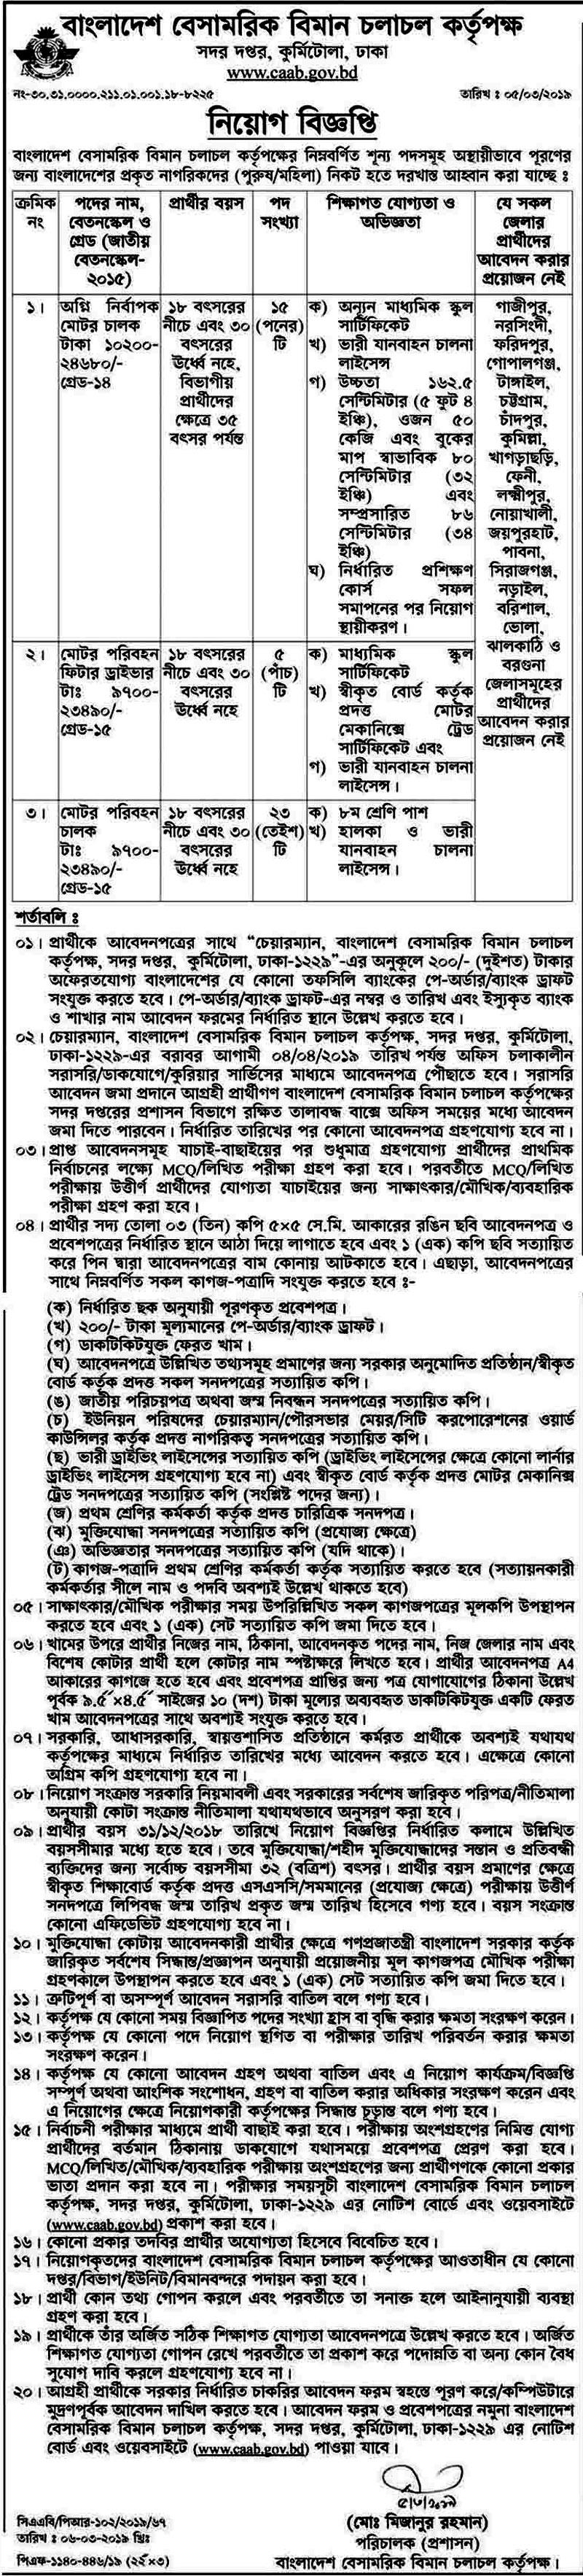 Civil Aviation Job Circular 2019